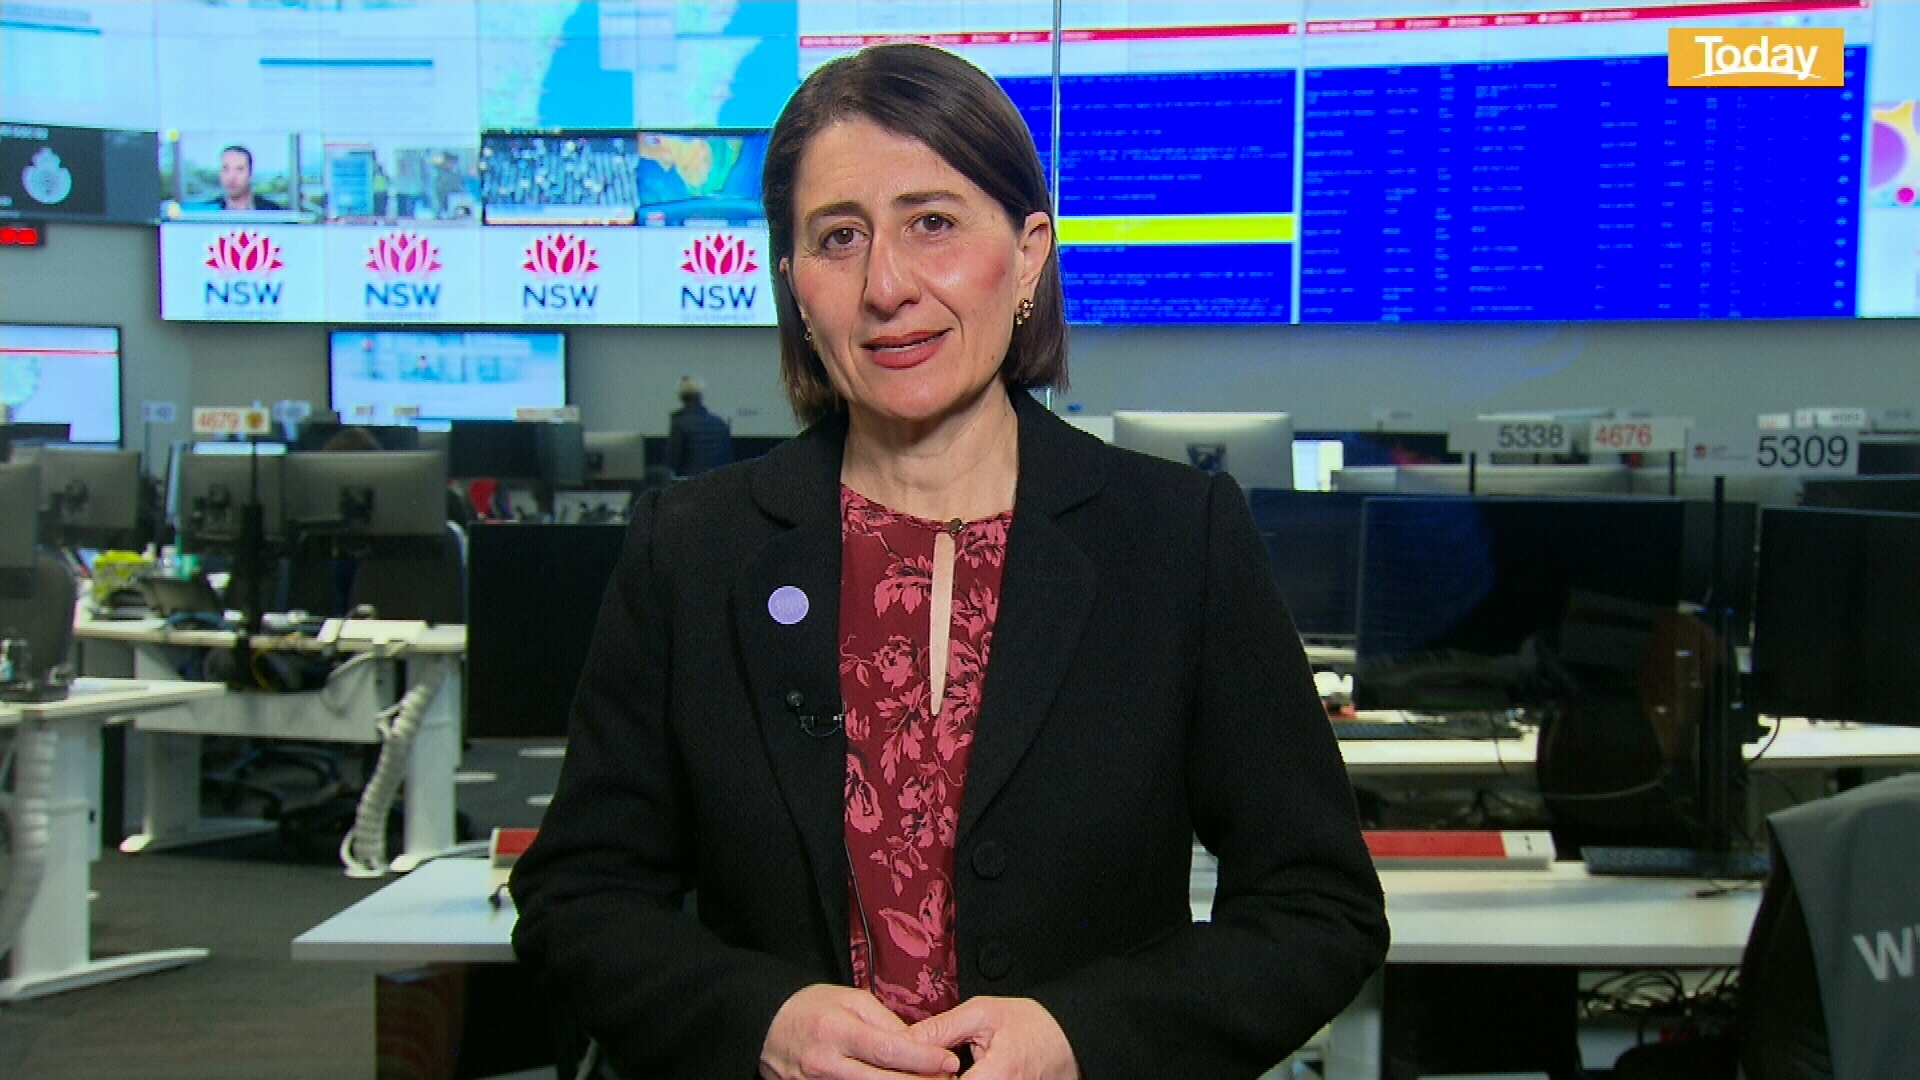 Coronavirus: NSW Premier open to NZ travel bubble